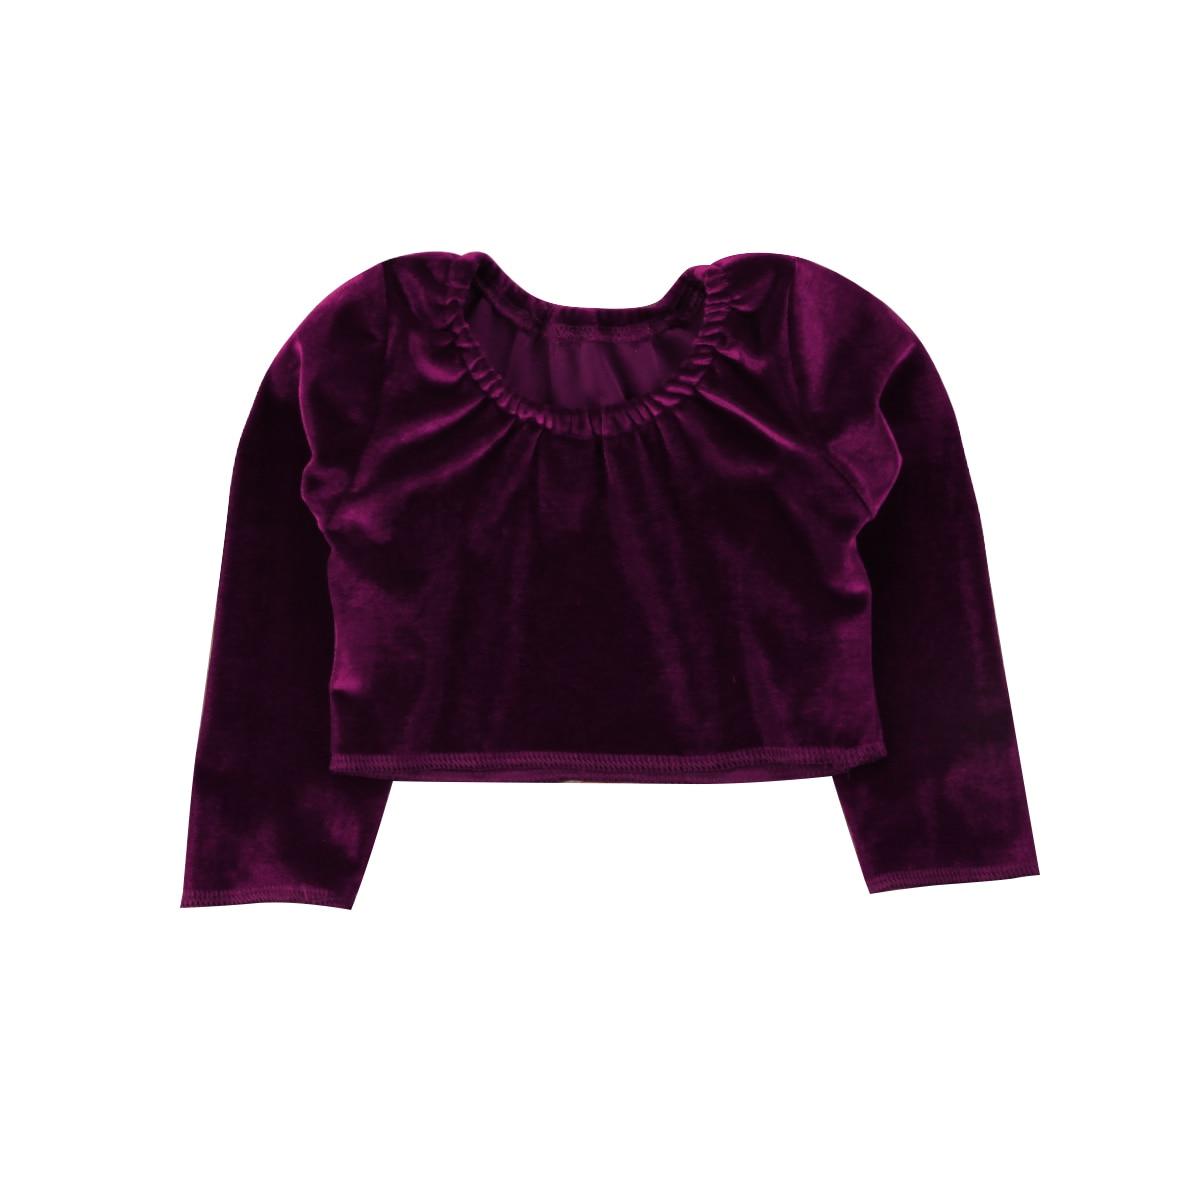 Toddler Kids Baby Girls Long Sleeve O-Neck Top T-shirt Tee Wine Red